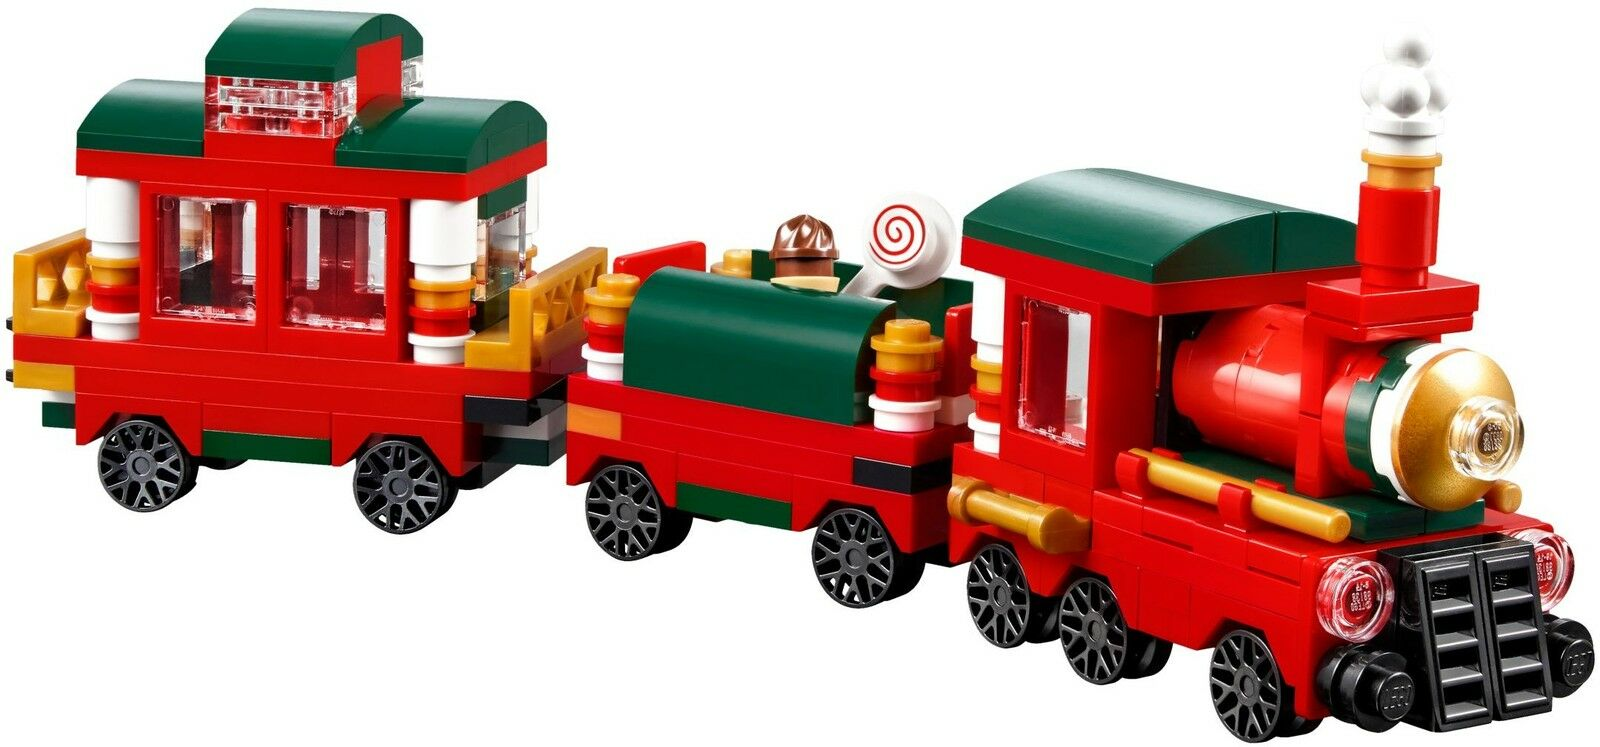 LEGO® Creator 40138 Weihnachtszug Weihnachtszug Weihnachtszug Limited Edition 2015 NEU OVP NEW MISB 40139 a363ad